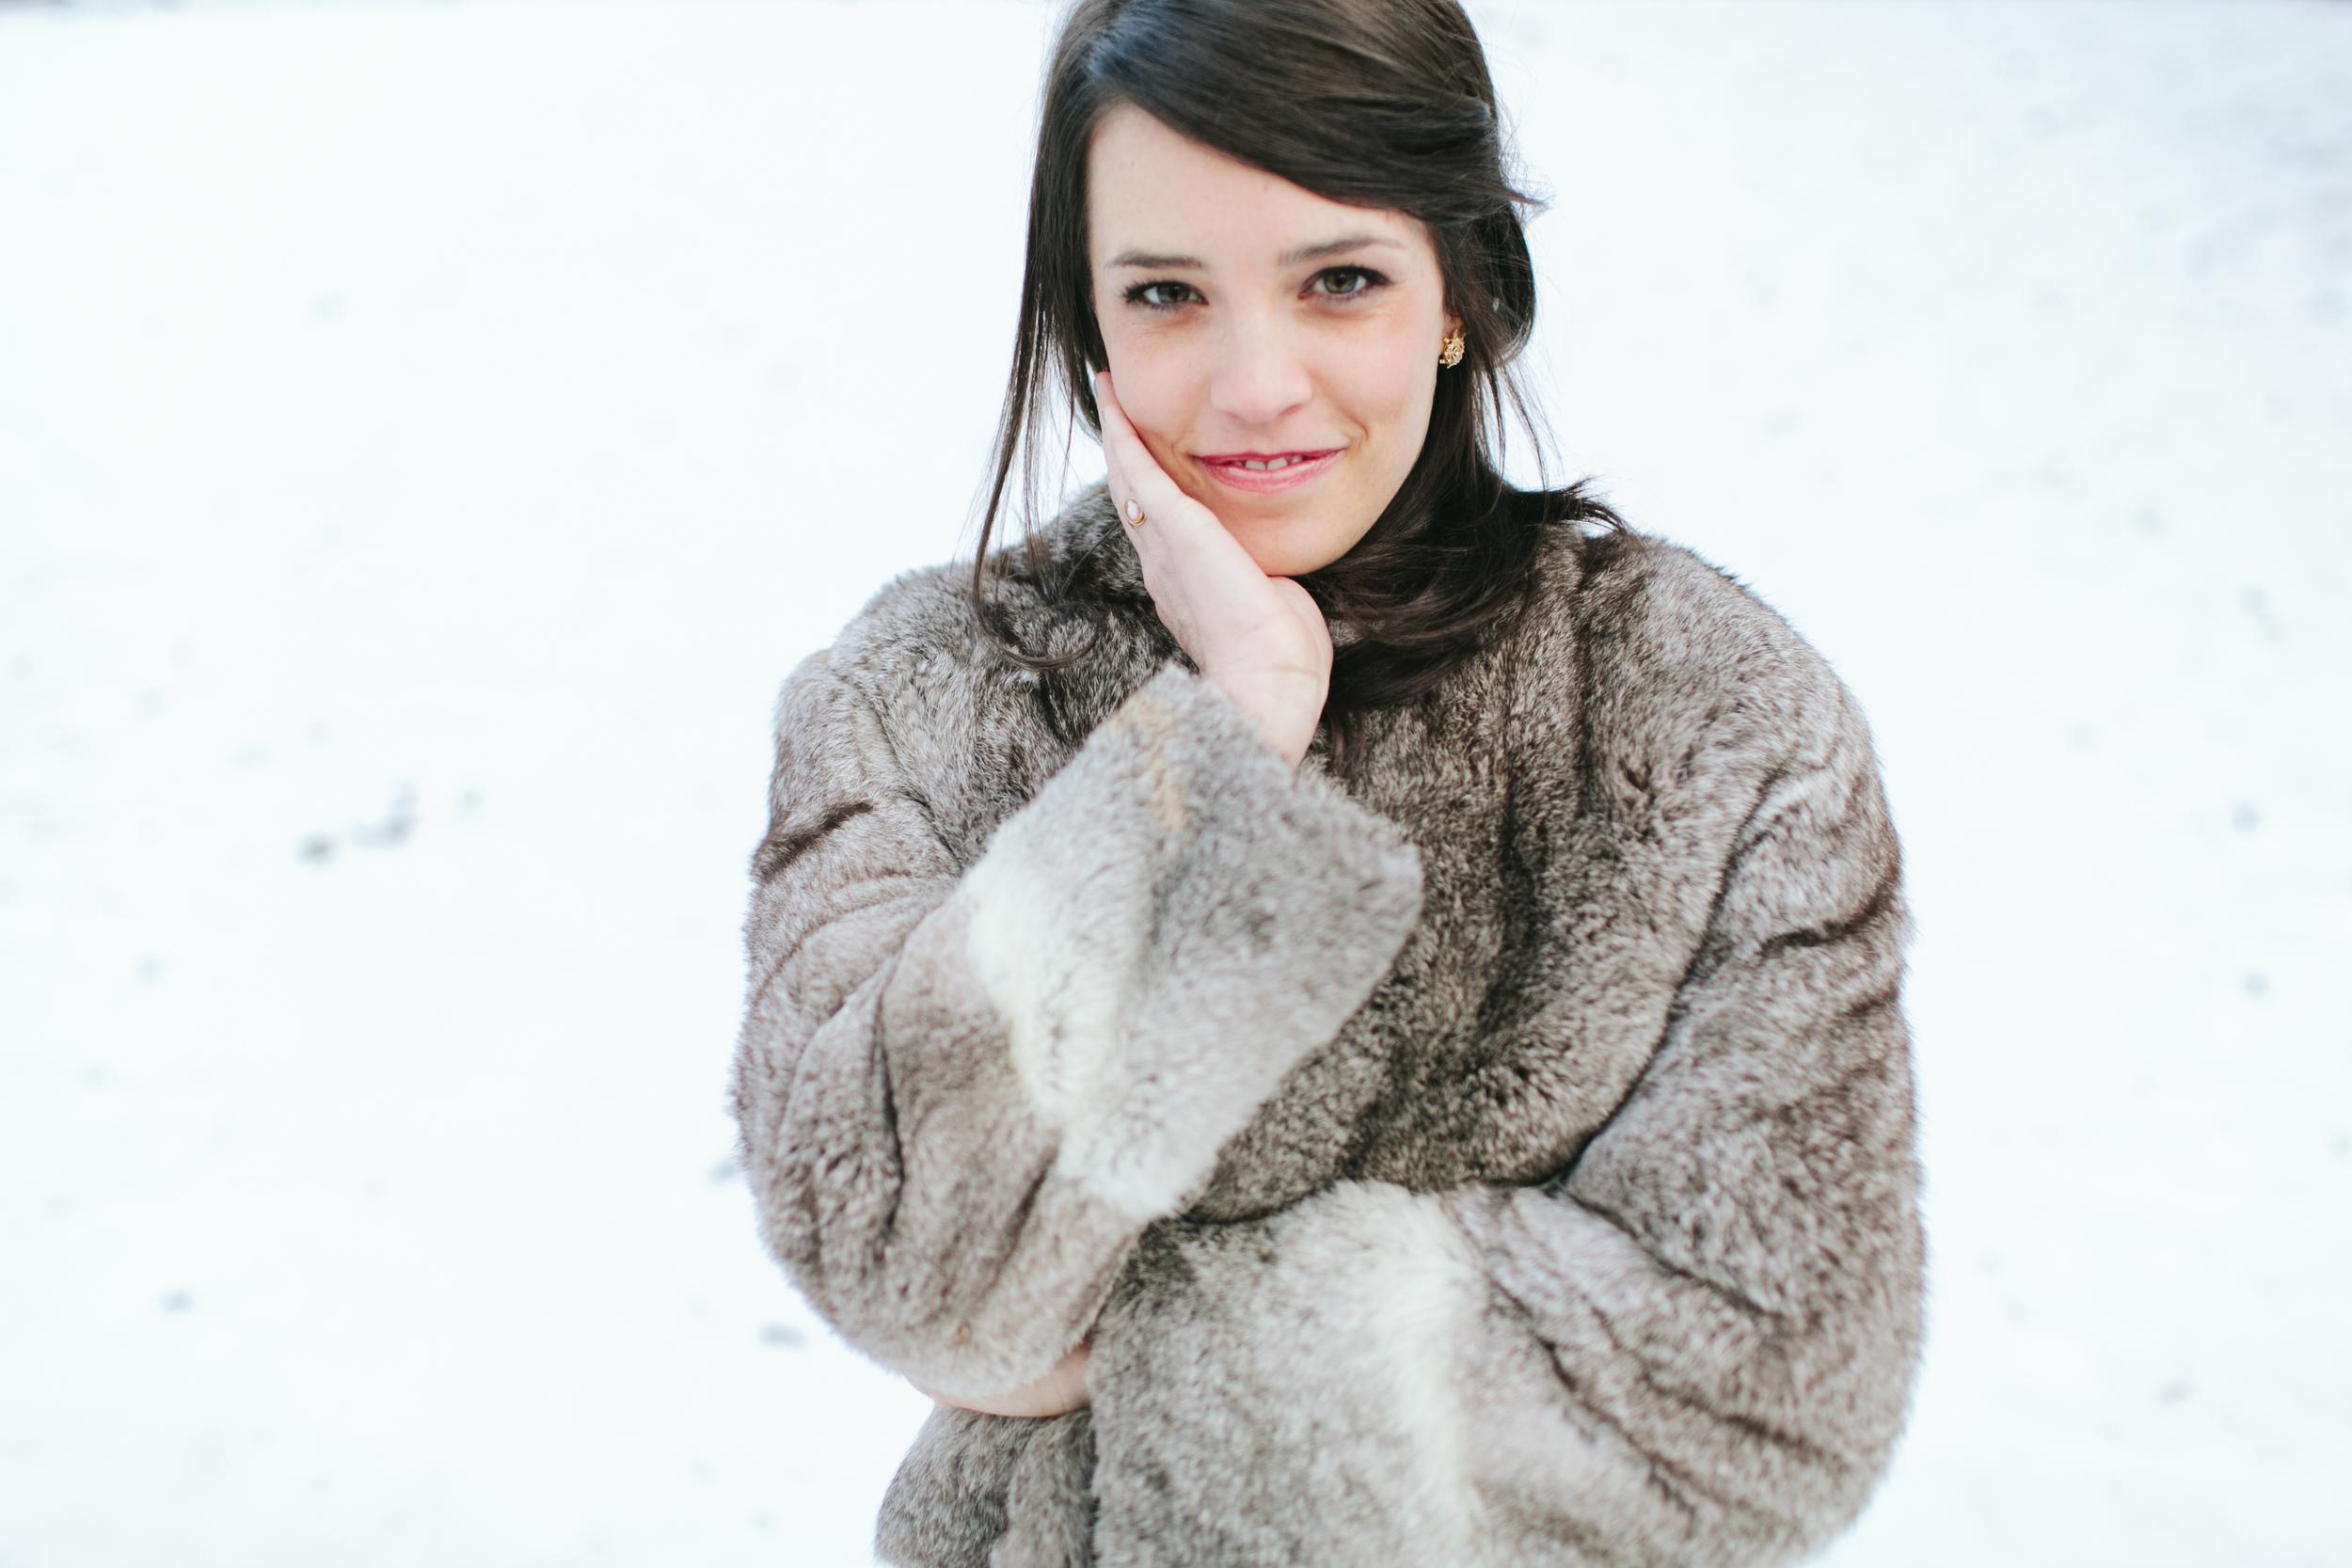 Atlanta-Fashion-Photographer-Kathryn-McCrary-Photography-Snow-Snowlanta-Fur-Coat-21.jpg